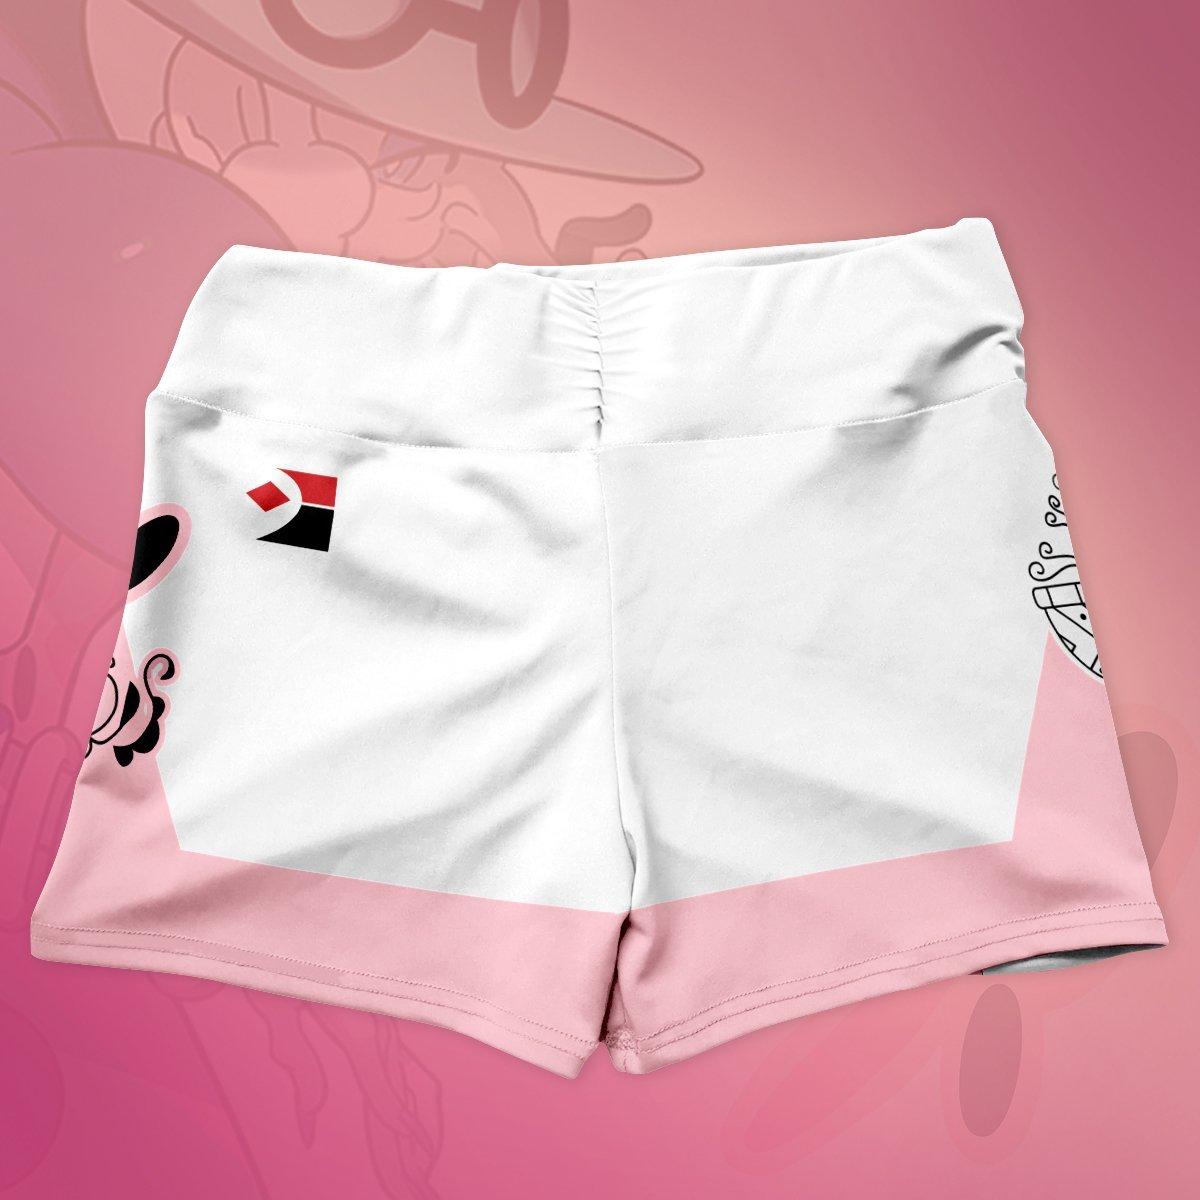 pokemon fairy uniform active wear set 470893 - Anime Swimsuits